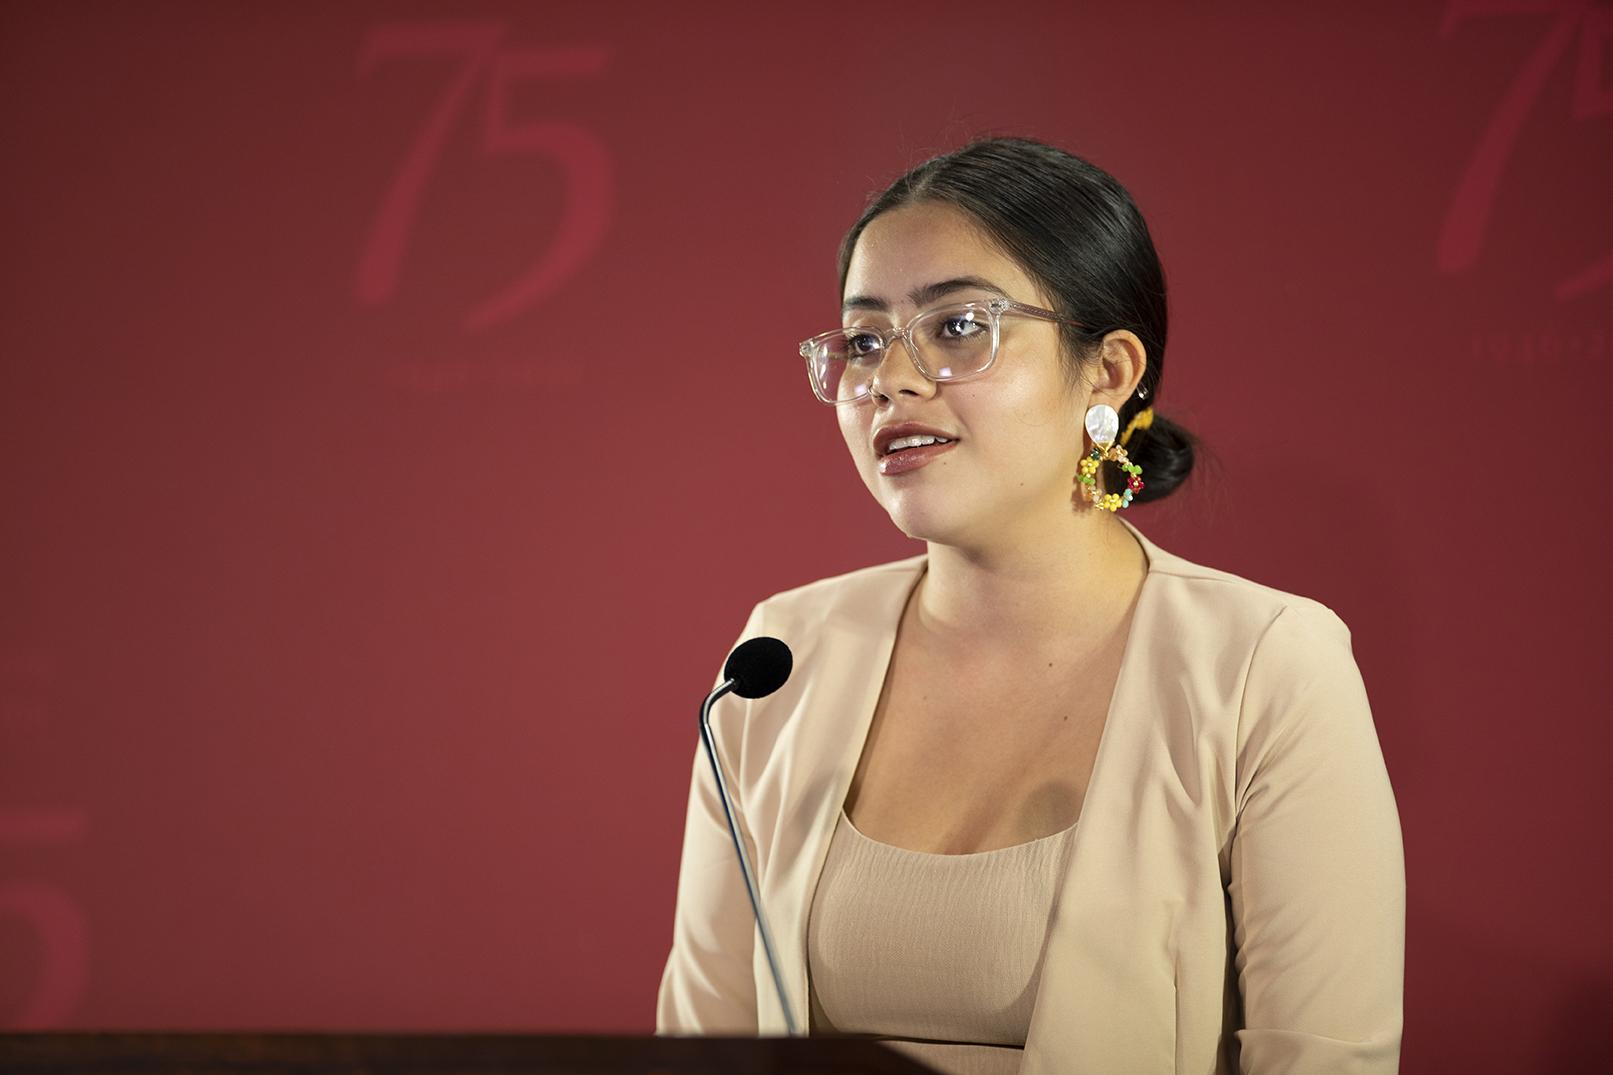 ASCMC President Katherine Almendarez '22 shares her final reflections